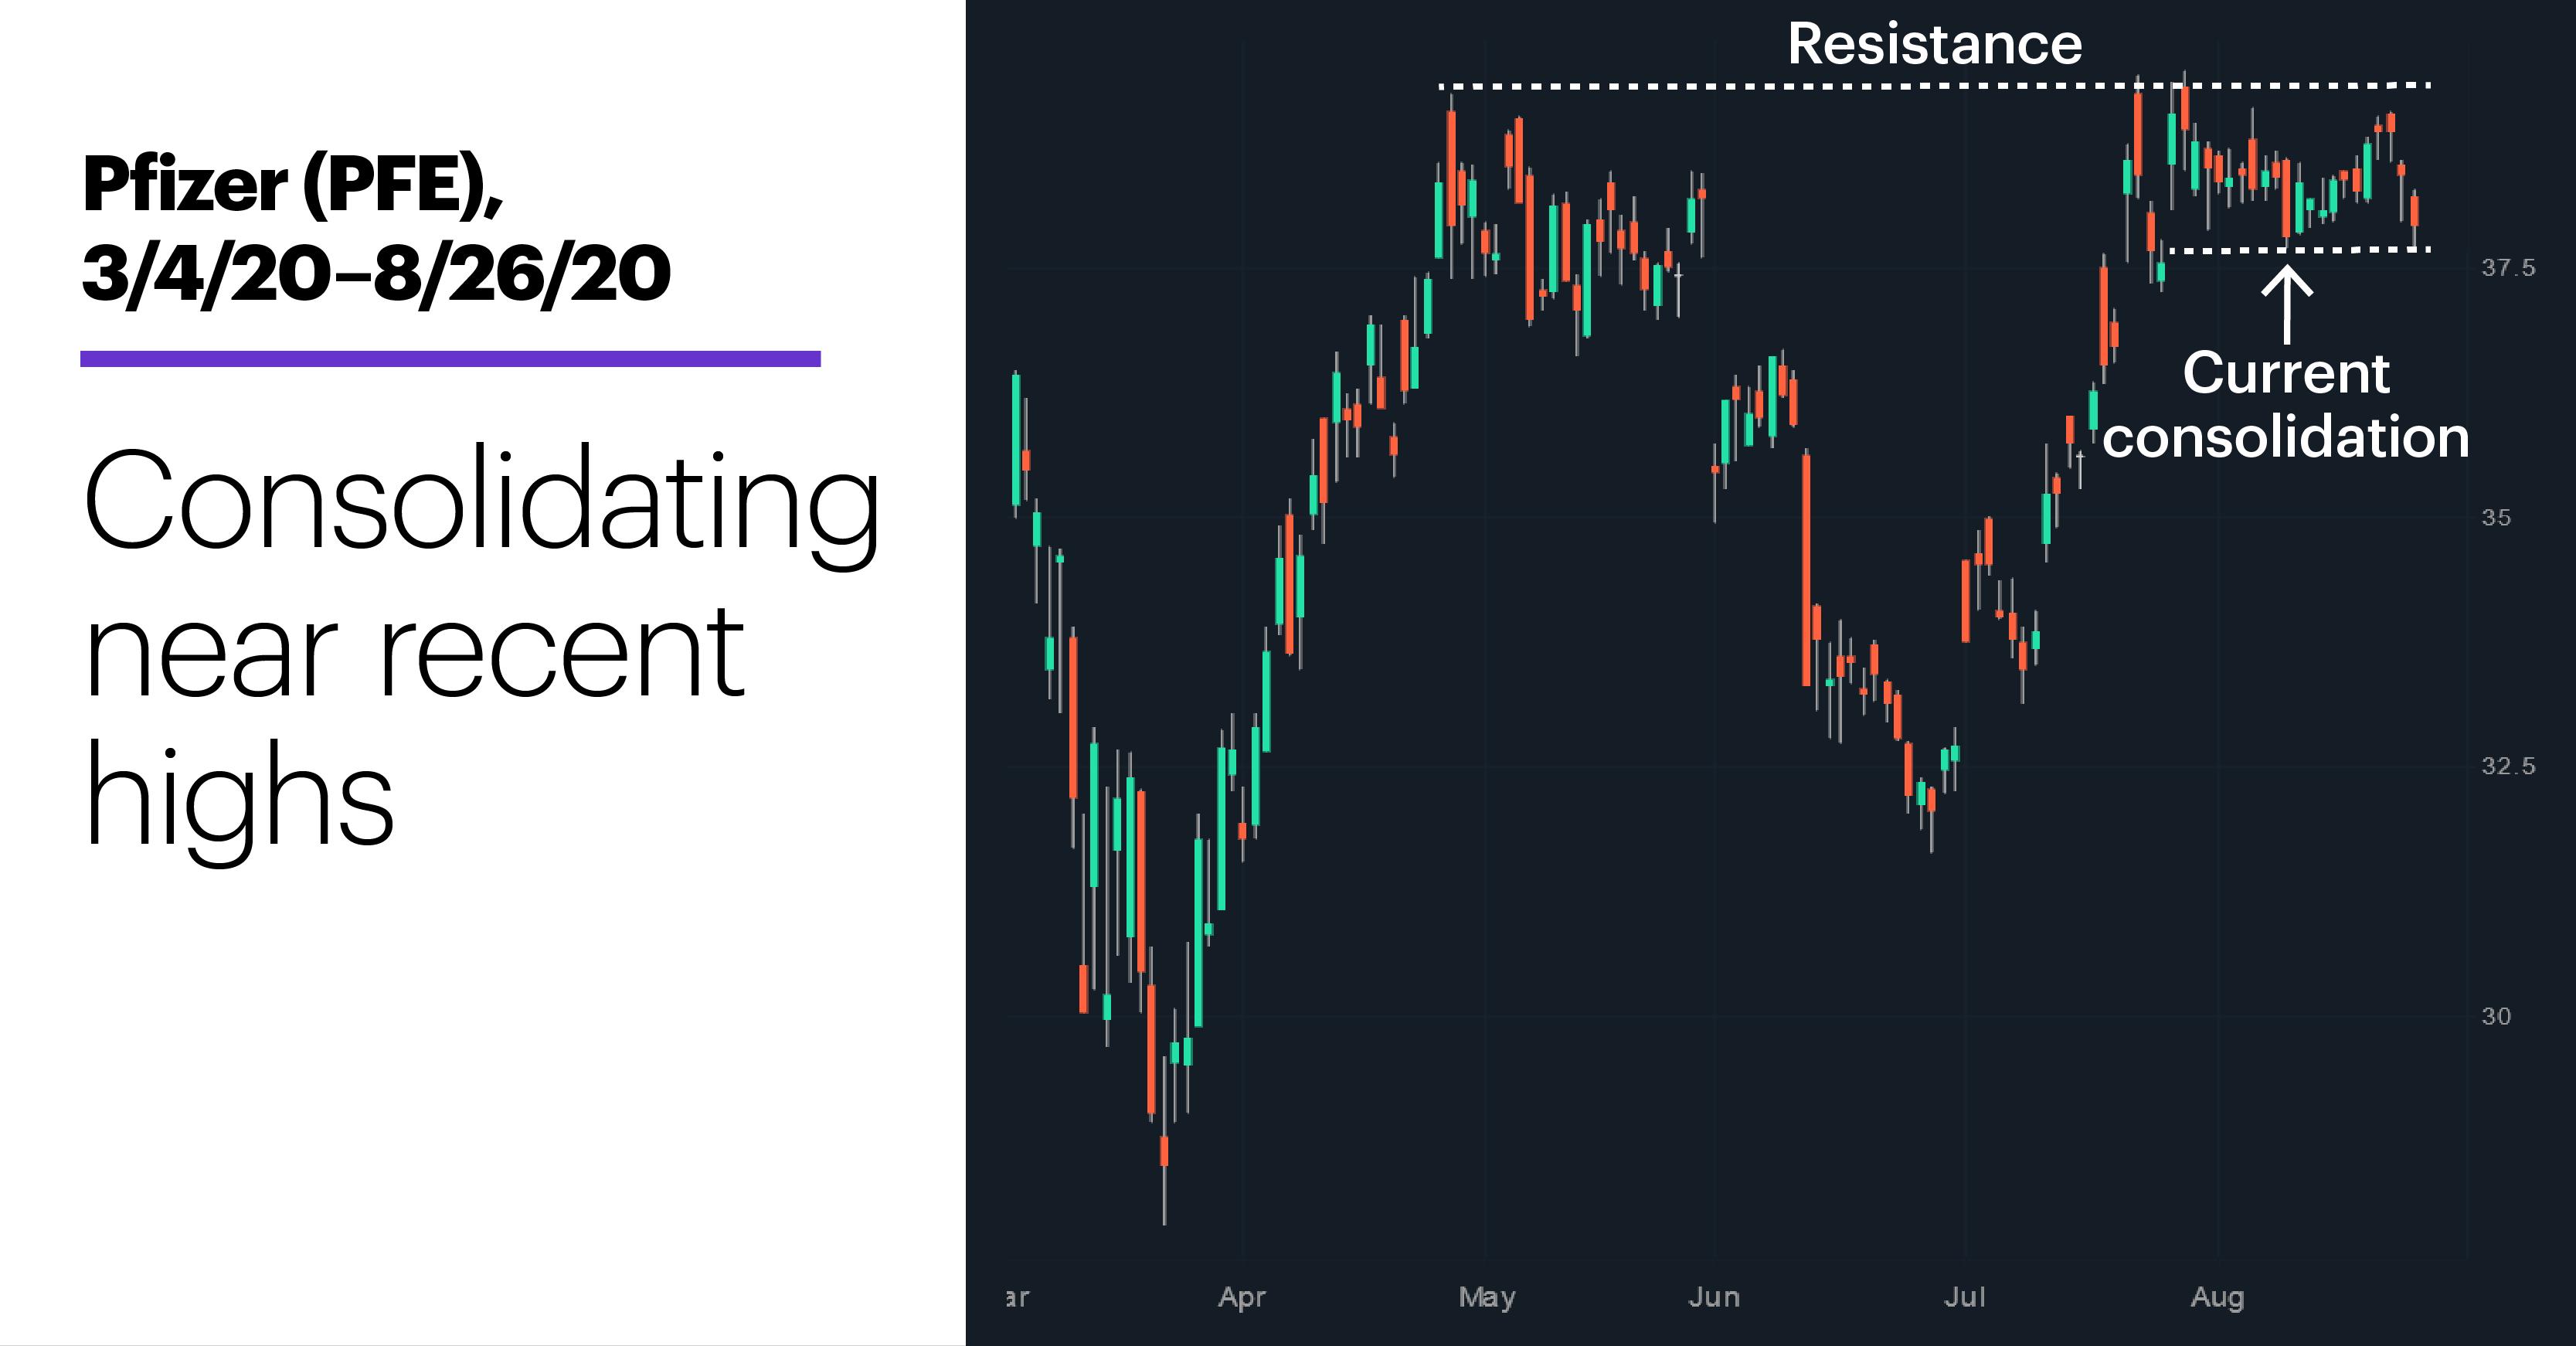 Chart 2: Pfizer (PFE), 3/4/20–8/26/20. Pfizer (PFE) price chart. Consolidating near recent highs.